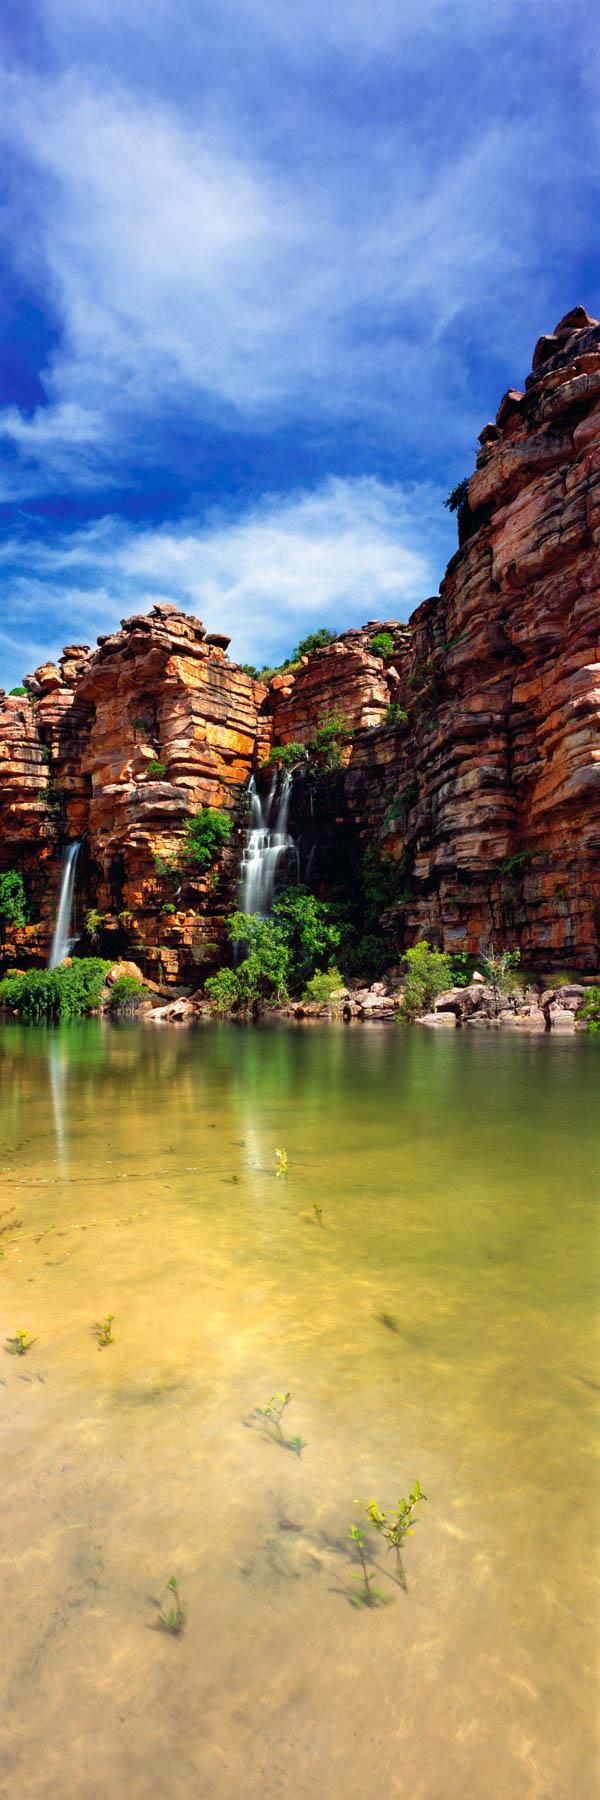 Tranquil Beach Falls, Kimberleys, WA, Australia.